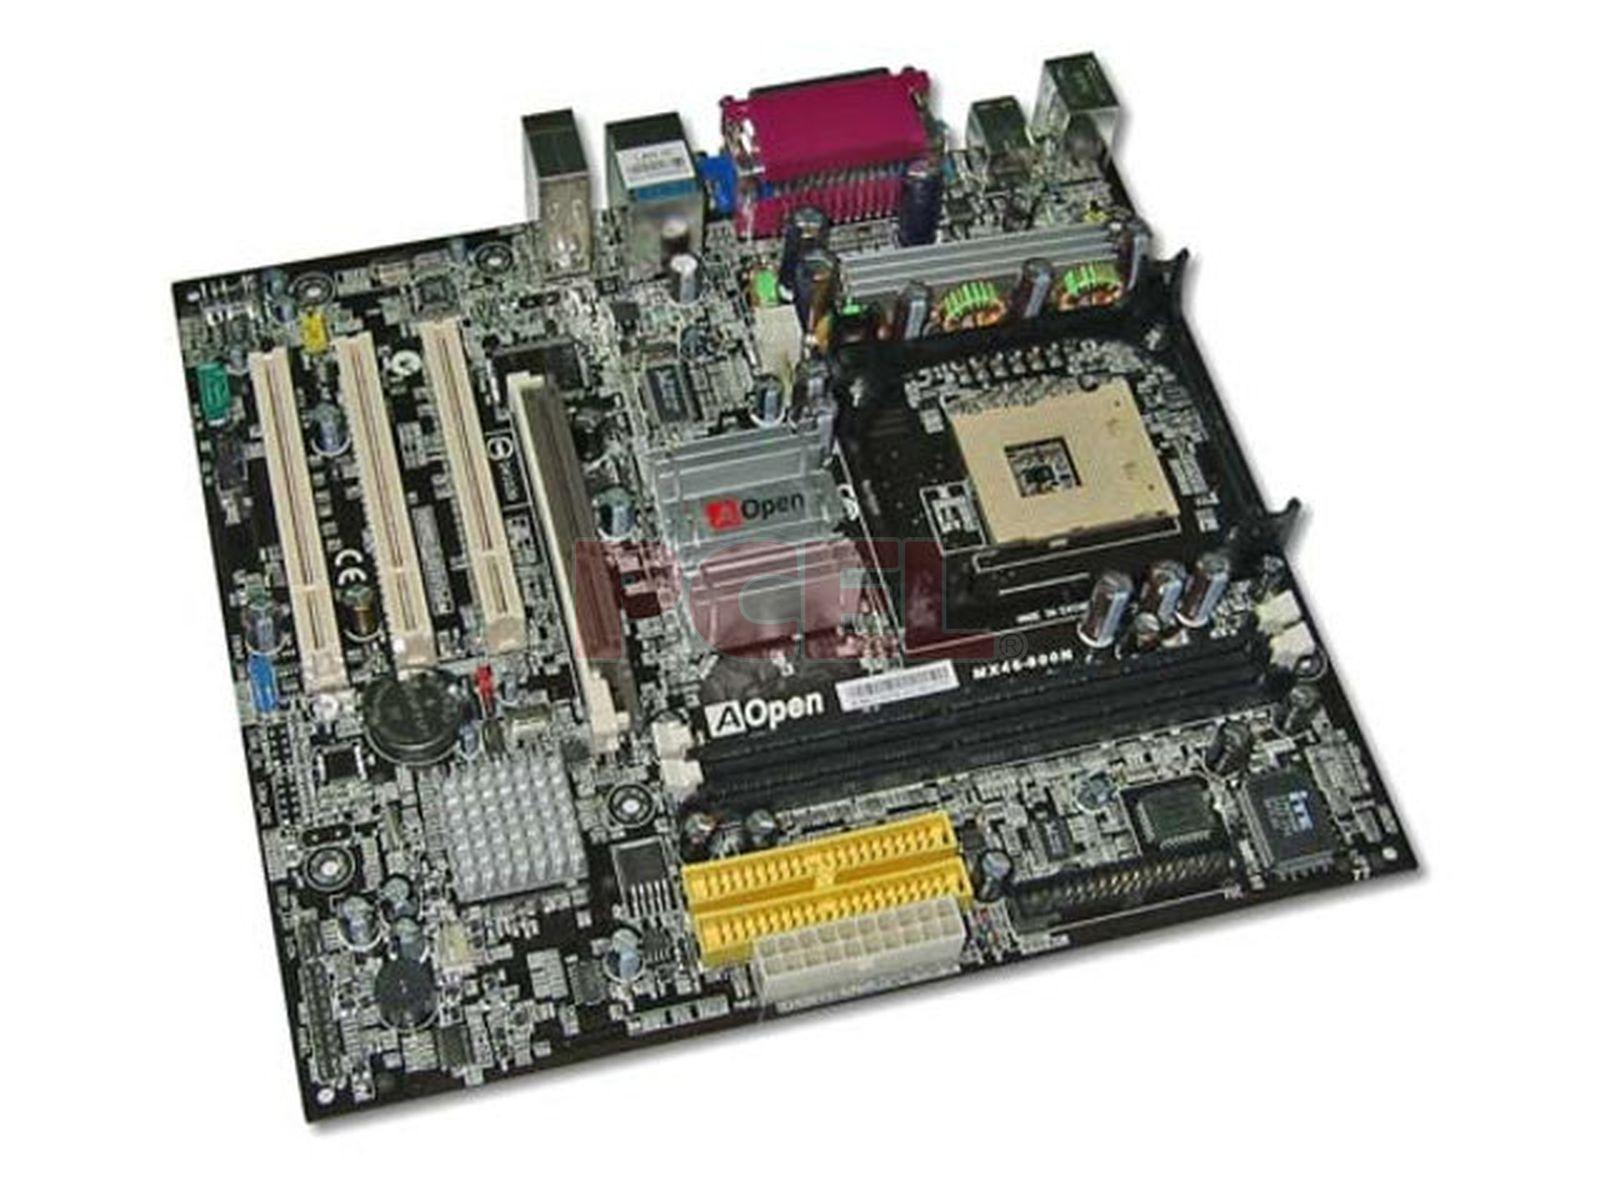 AOPEN MX46-800N LAN WINDOWS 10 DOWNLOAD DRIVER